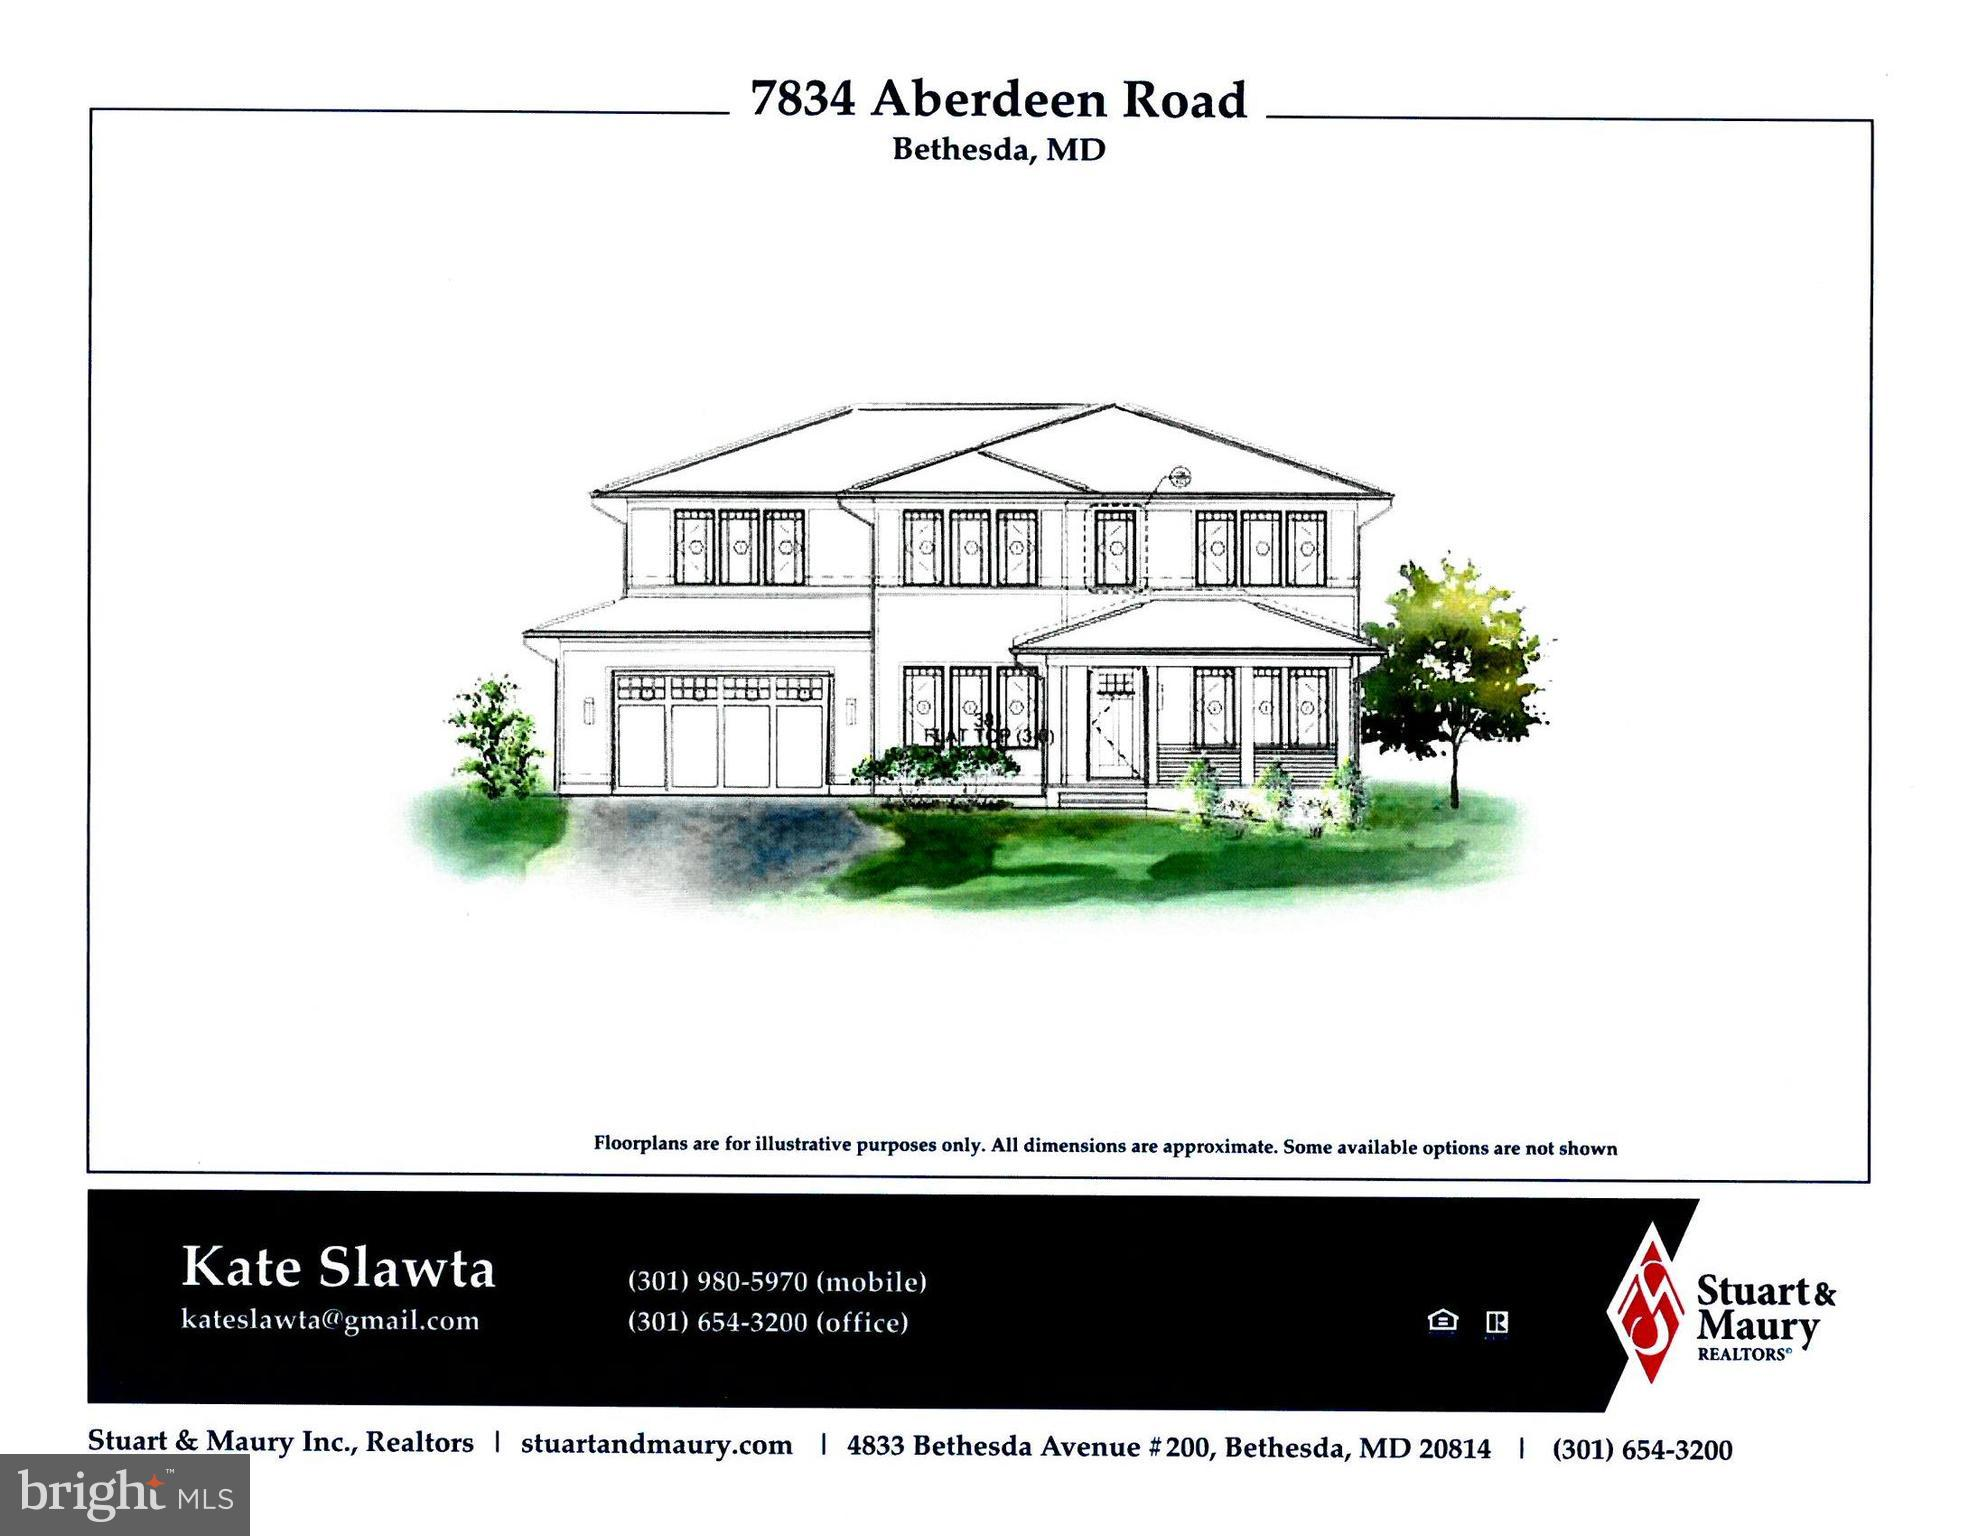 7834 ABERDEEN ROAD, BETHESDA, MD 20814